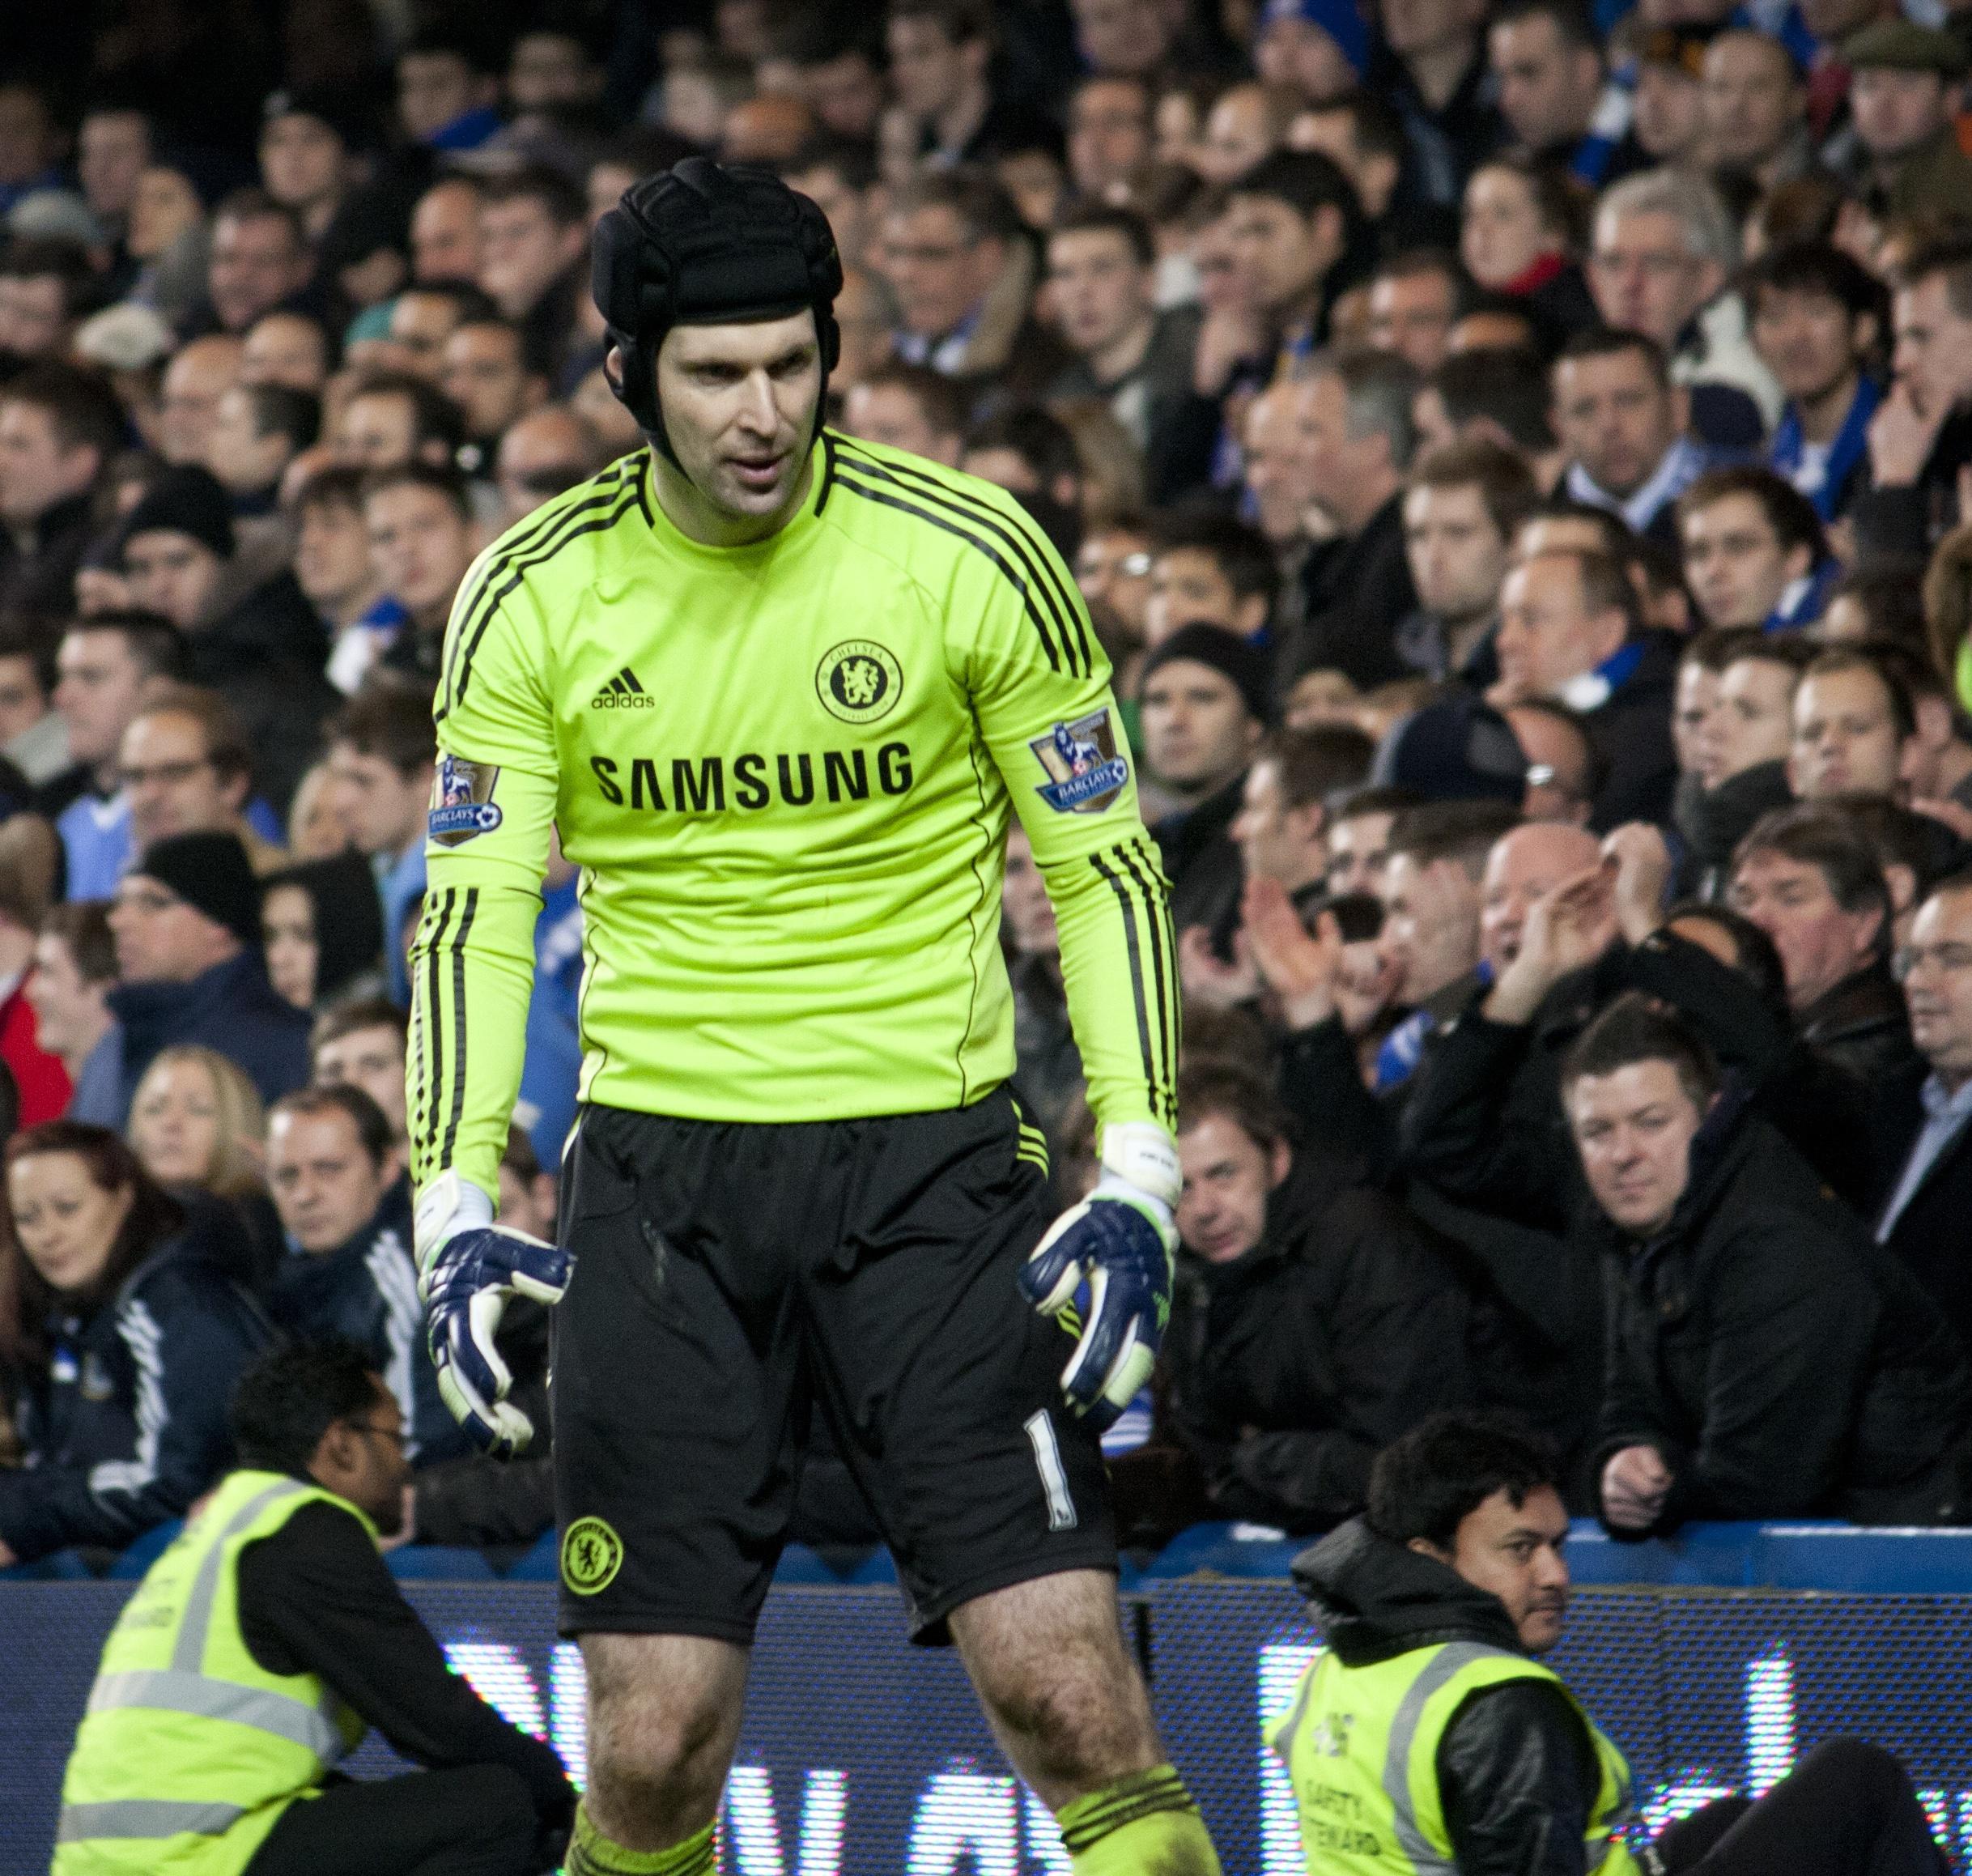 520a5f455 File Petr Cech - Chelsea vs Bolton Wanderers.jpg - Wikimedia Commons